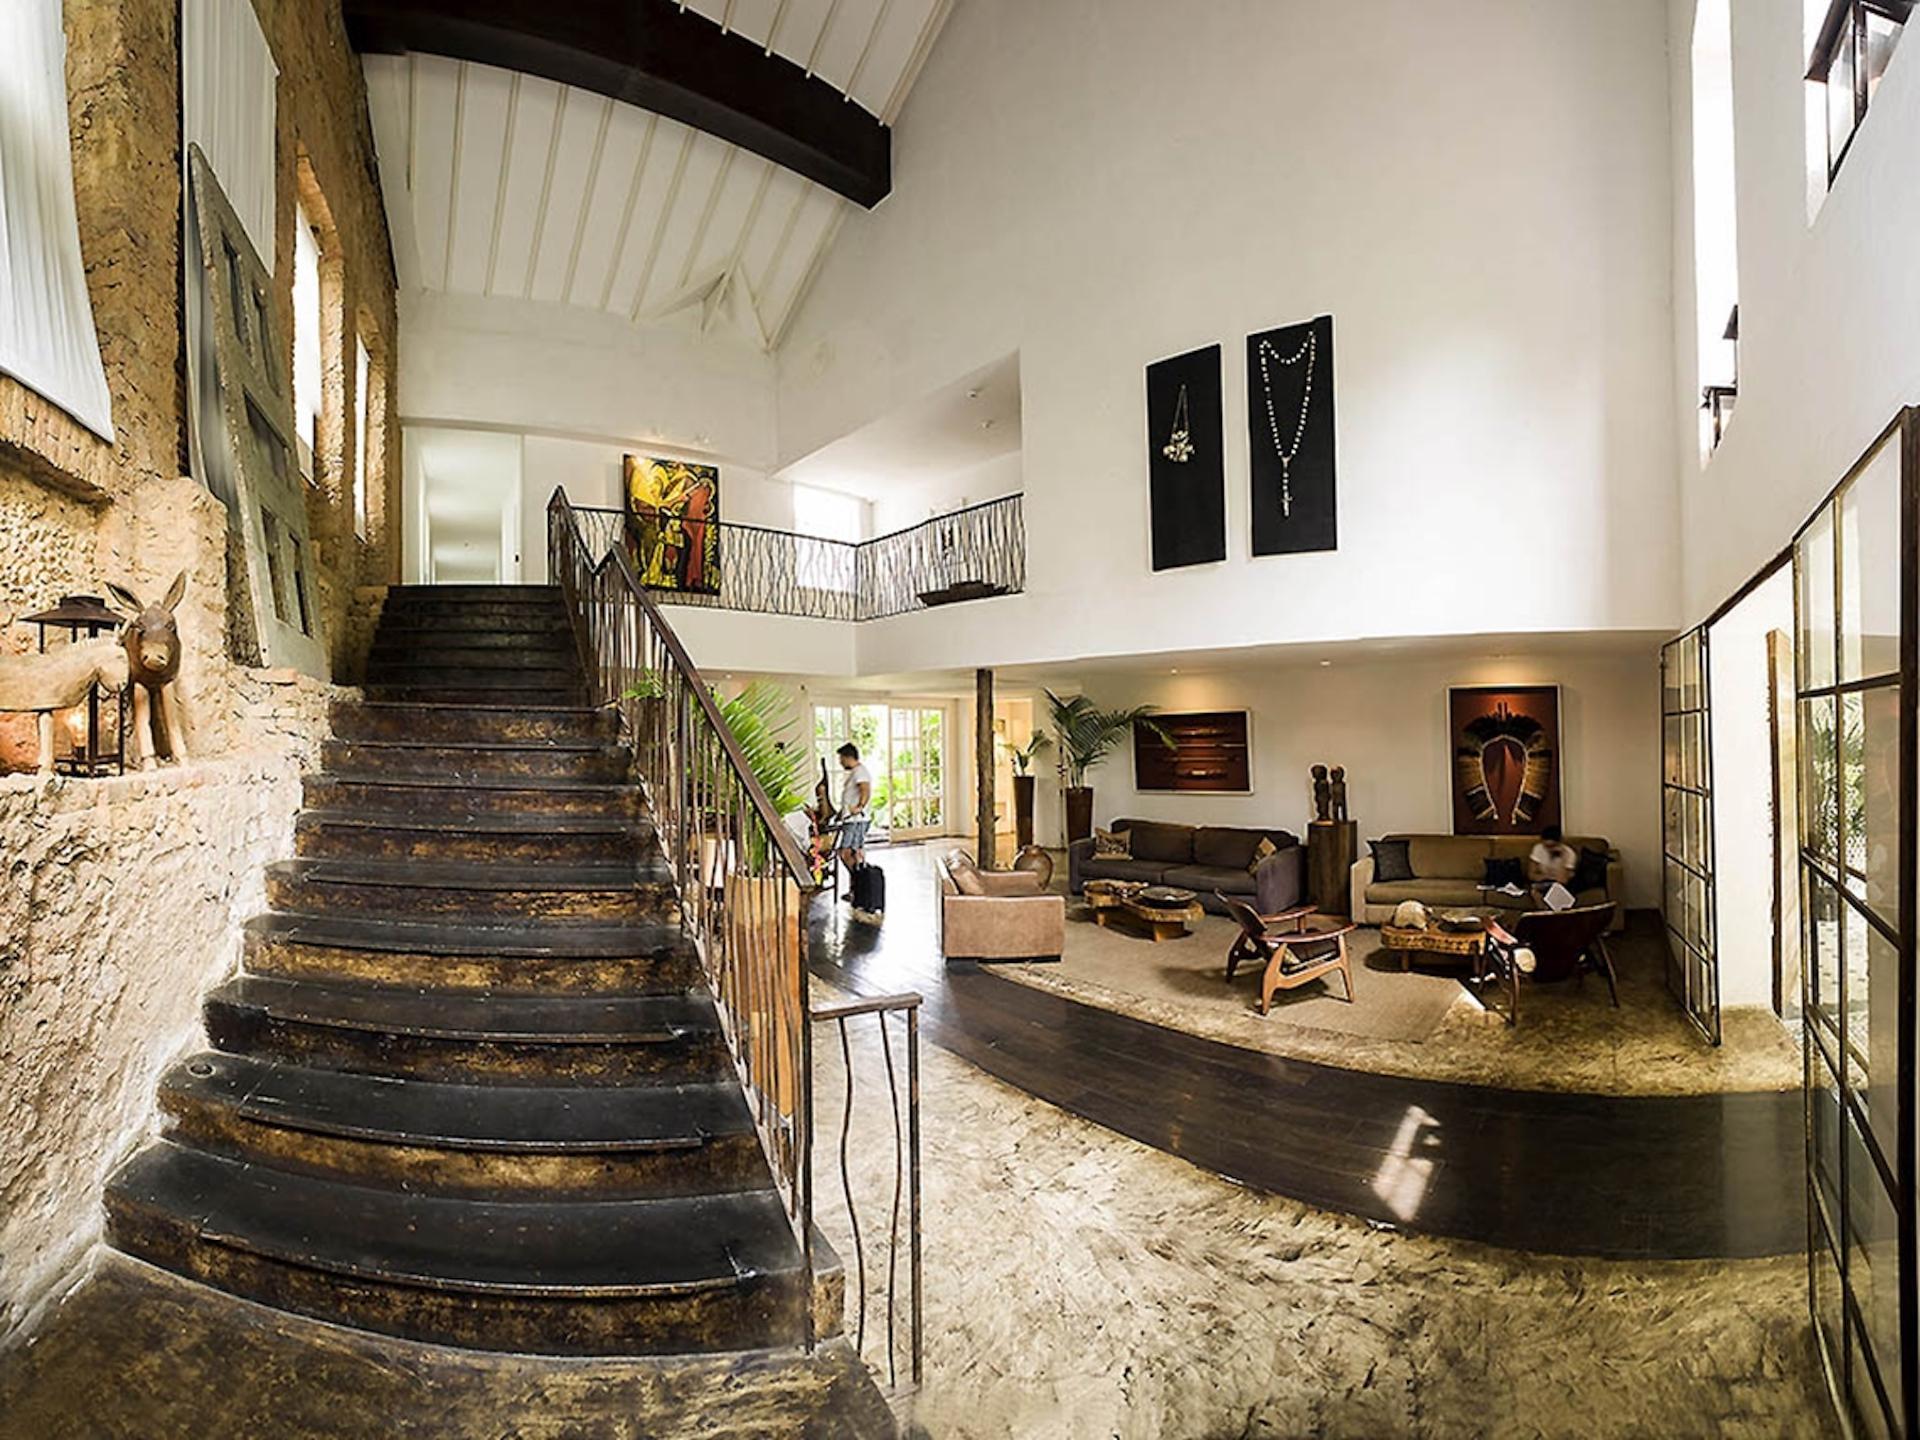 Lobby des Hotel Santa Teresa in Rio de Janeiro, Brasilien